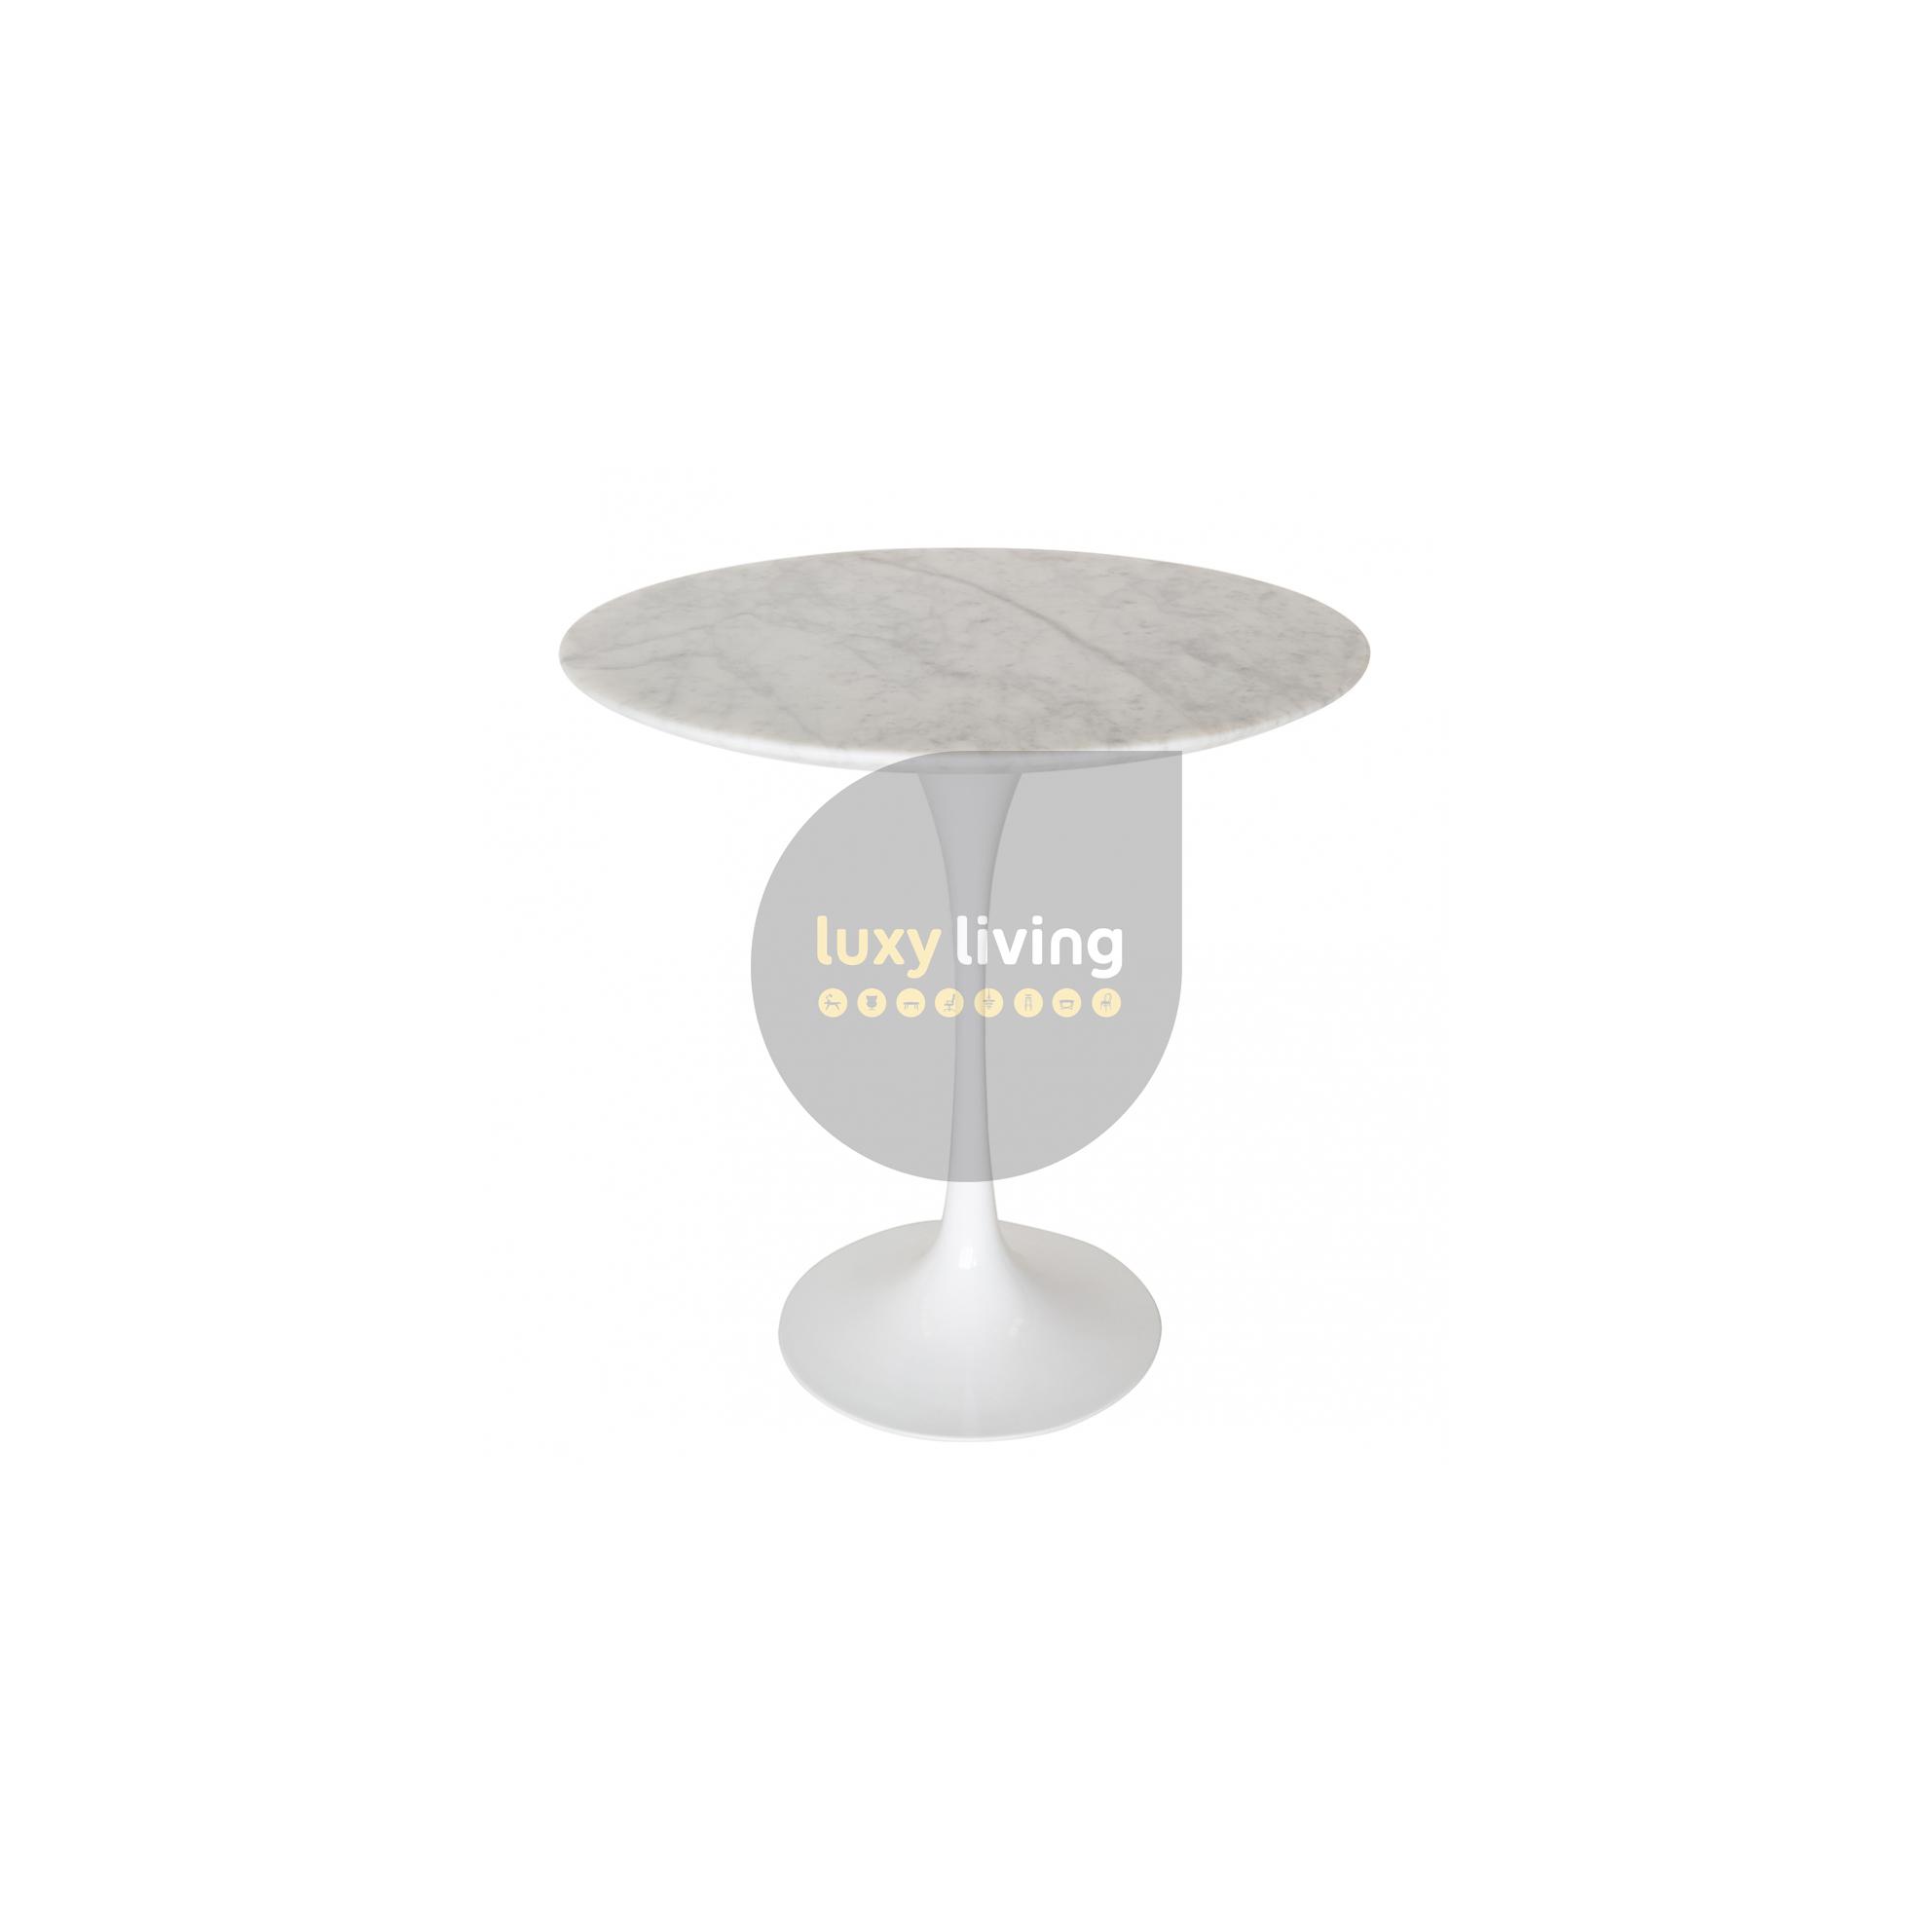 Replica Eero Saarinen Tulip Marble Side Table White